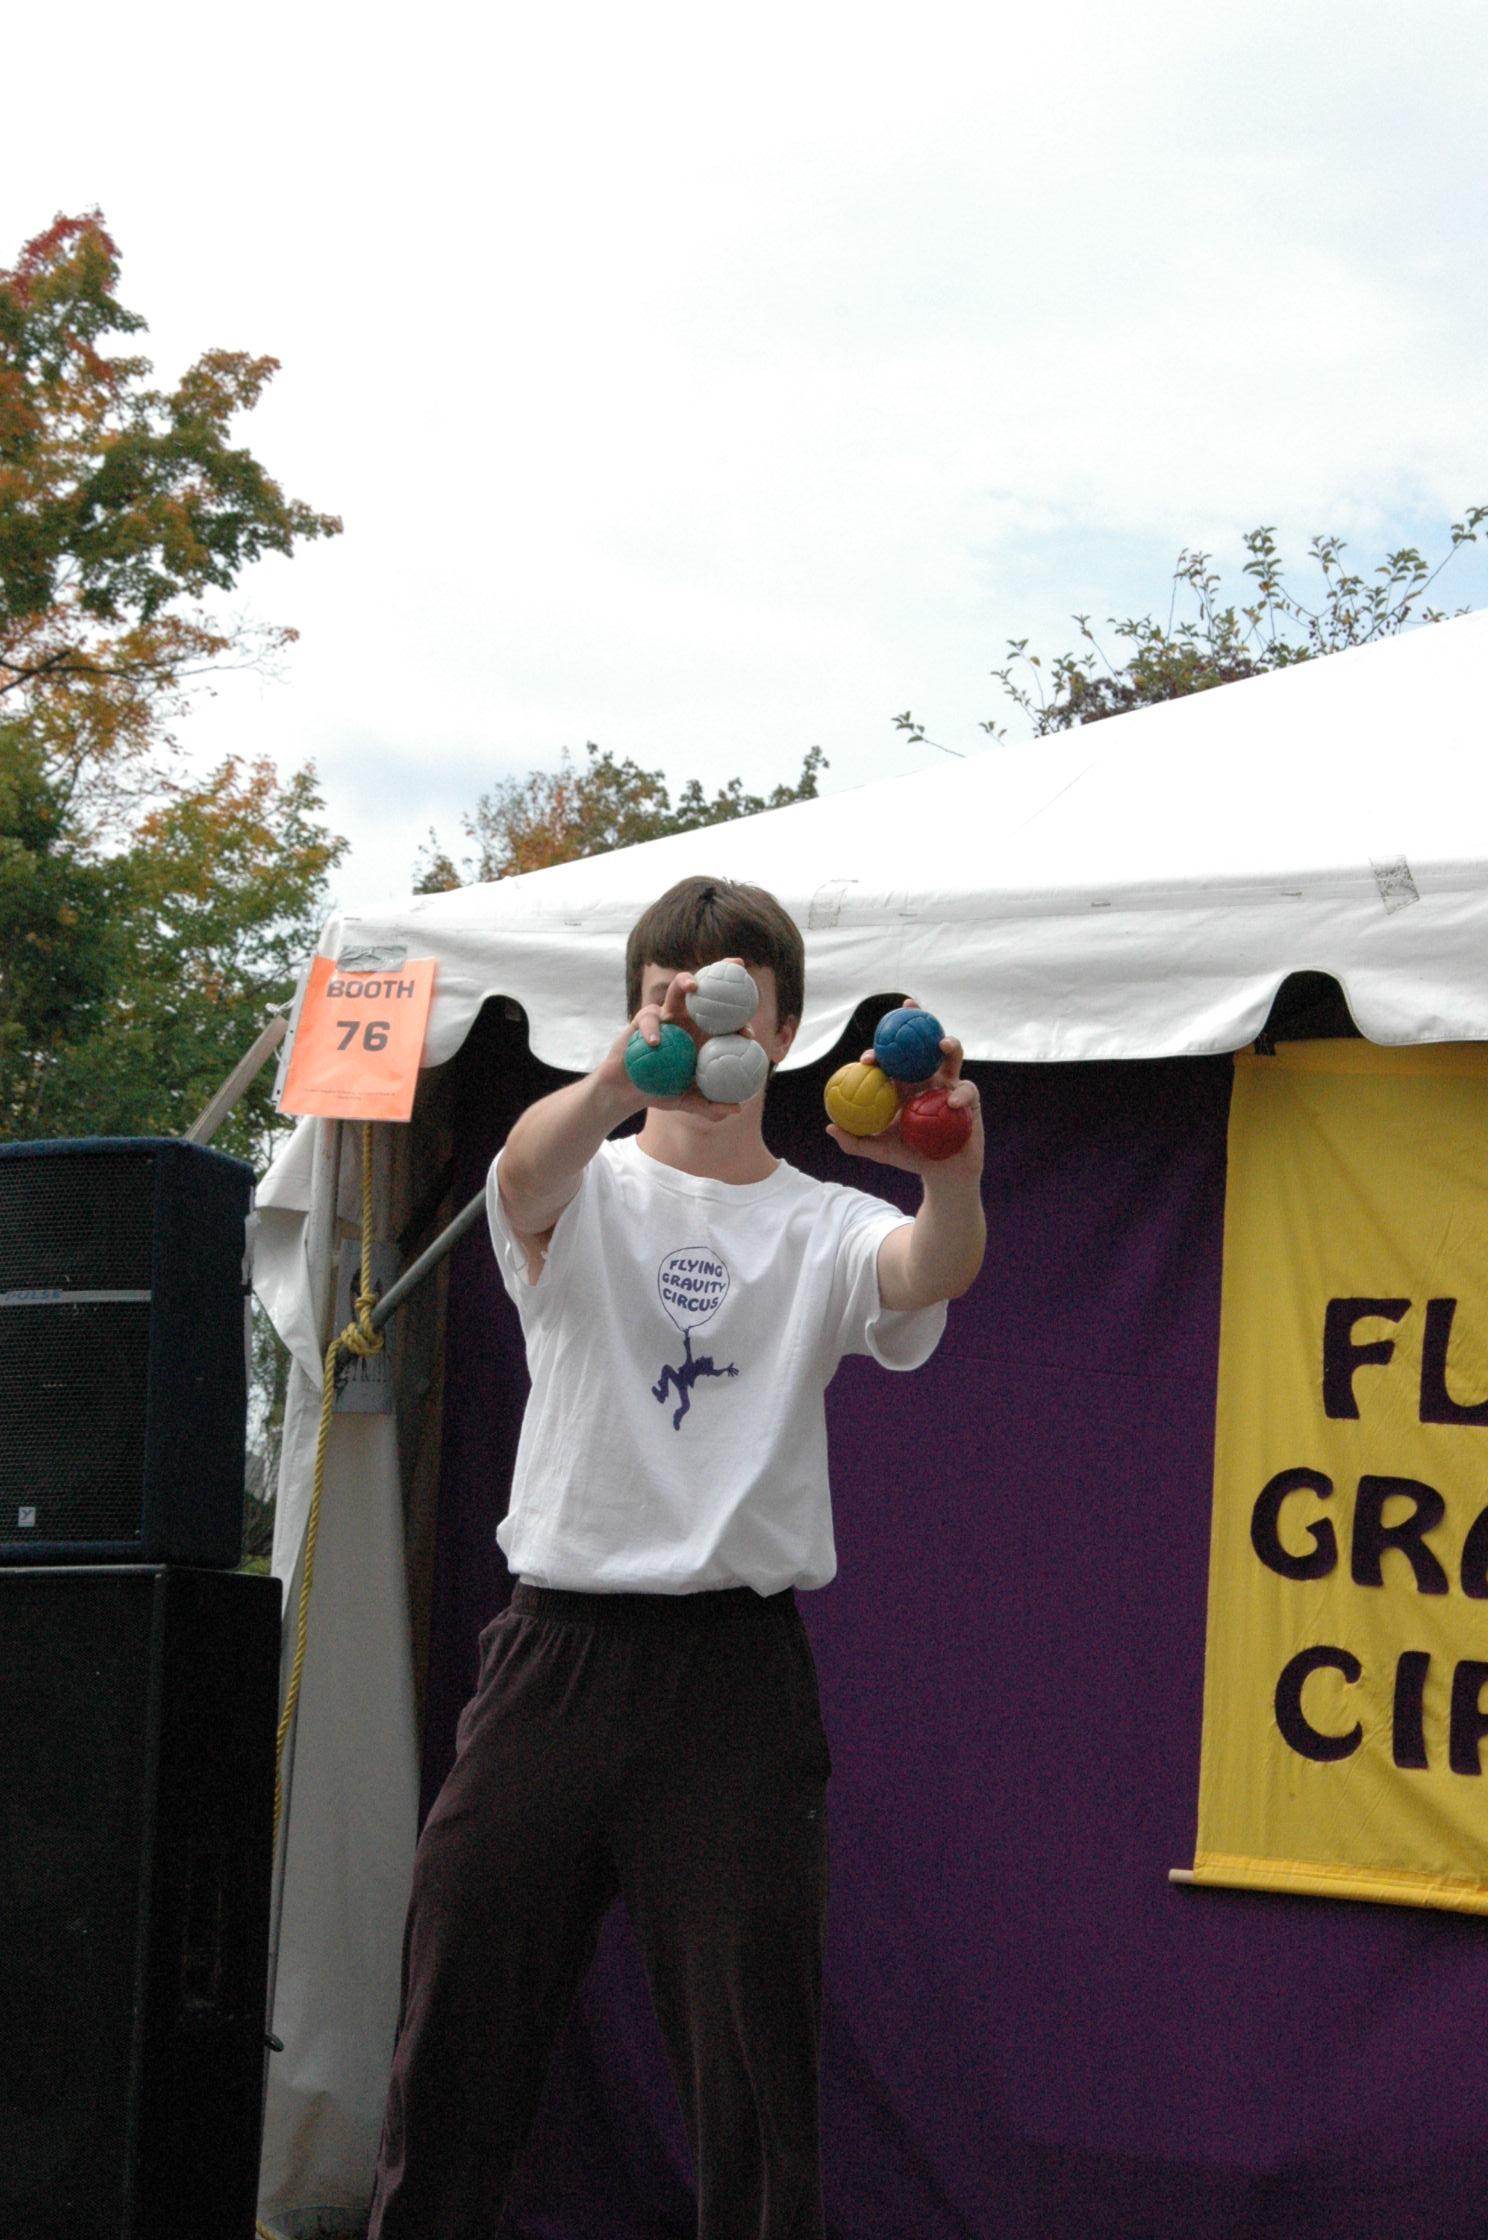 2012-10-06 Flyin Gravity Circus - Pumpkin 063.JPG